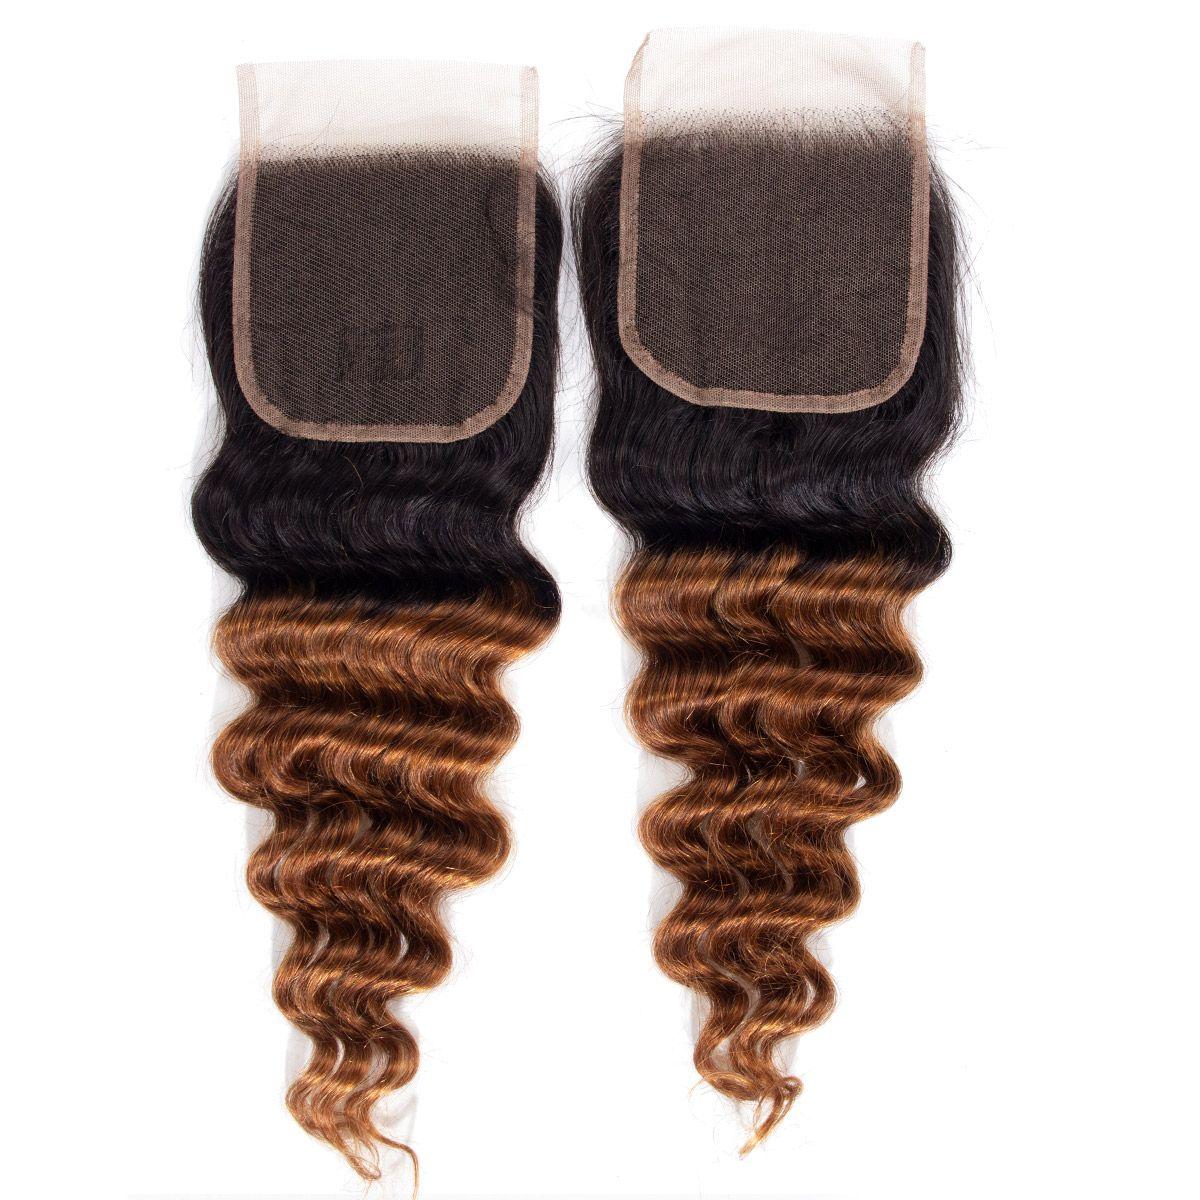 1B/30 deep wave Hair 3 Bundles With Closure